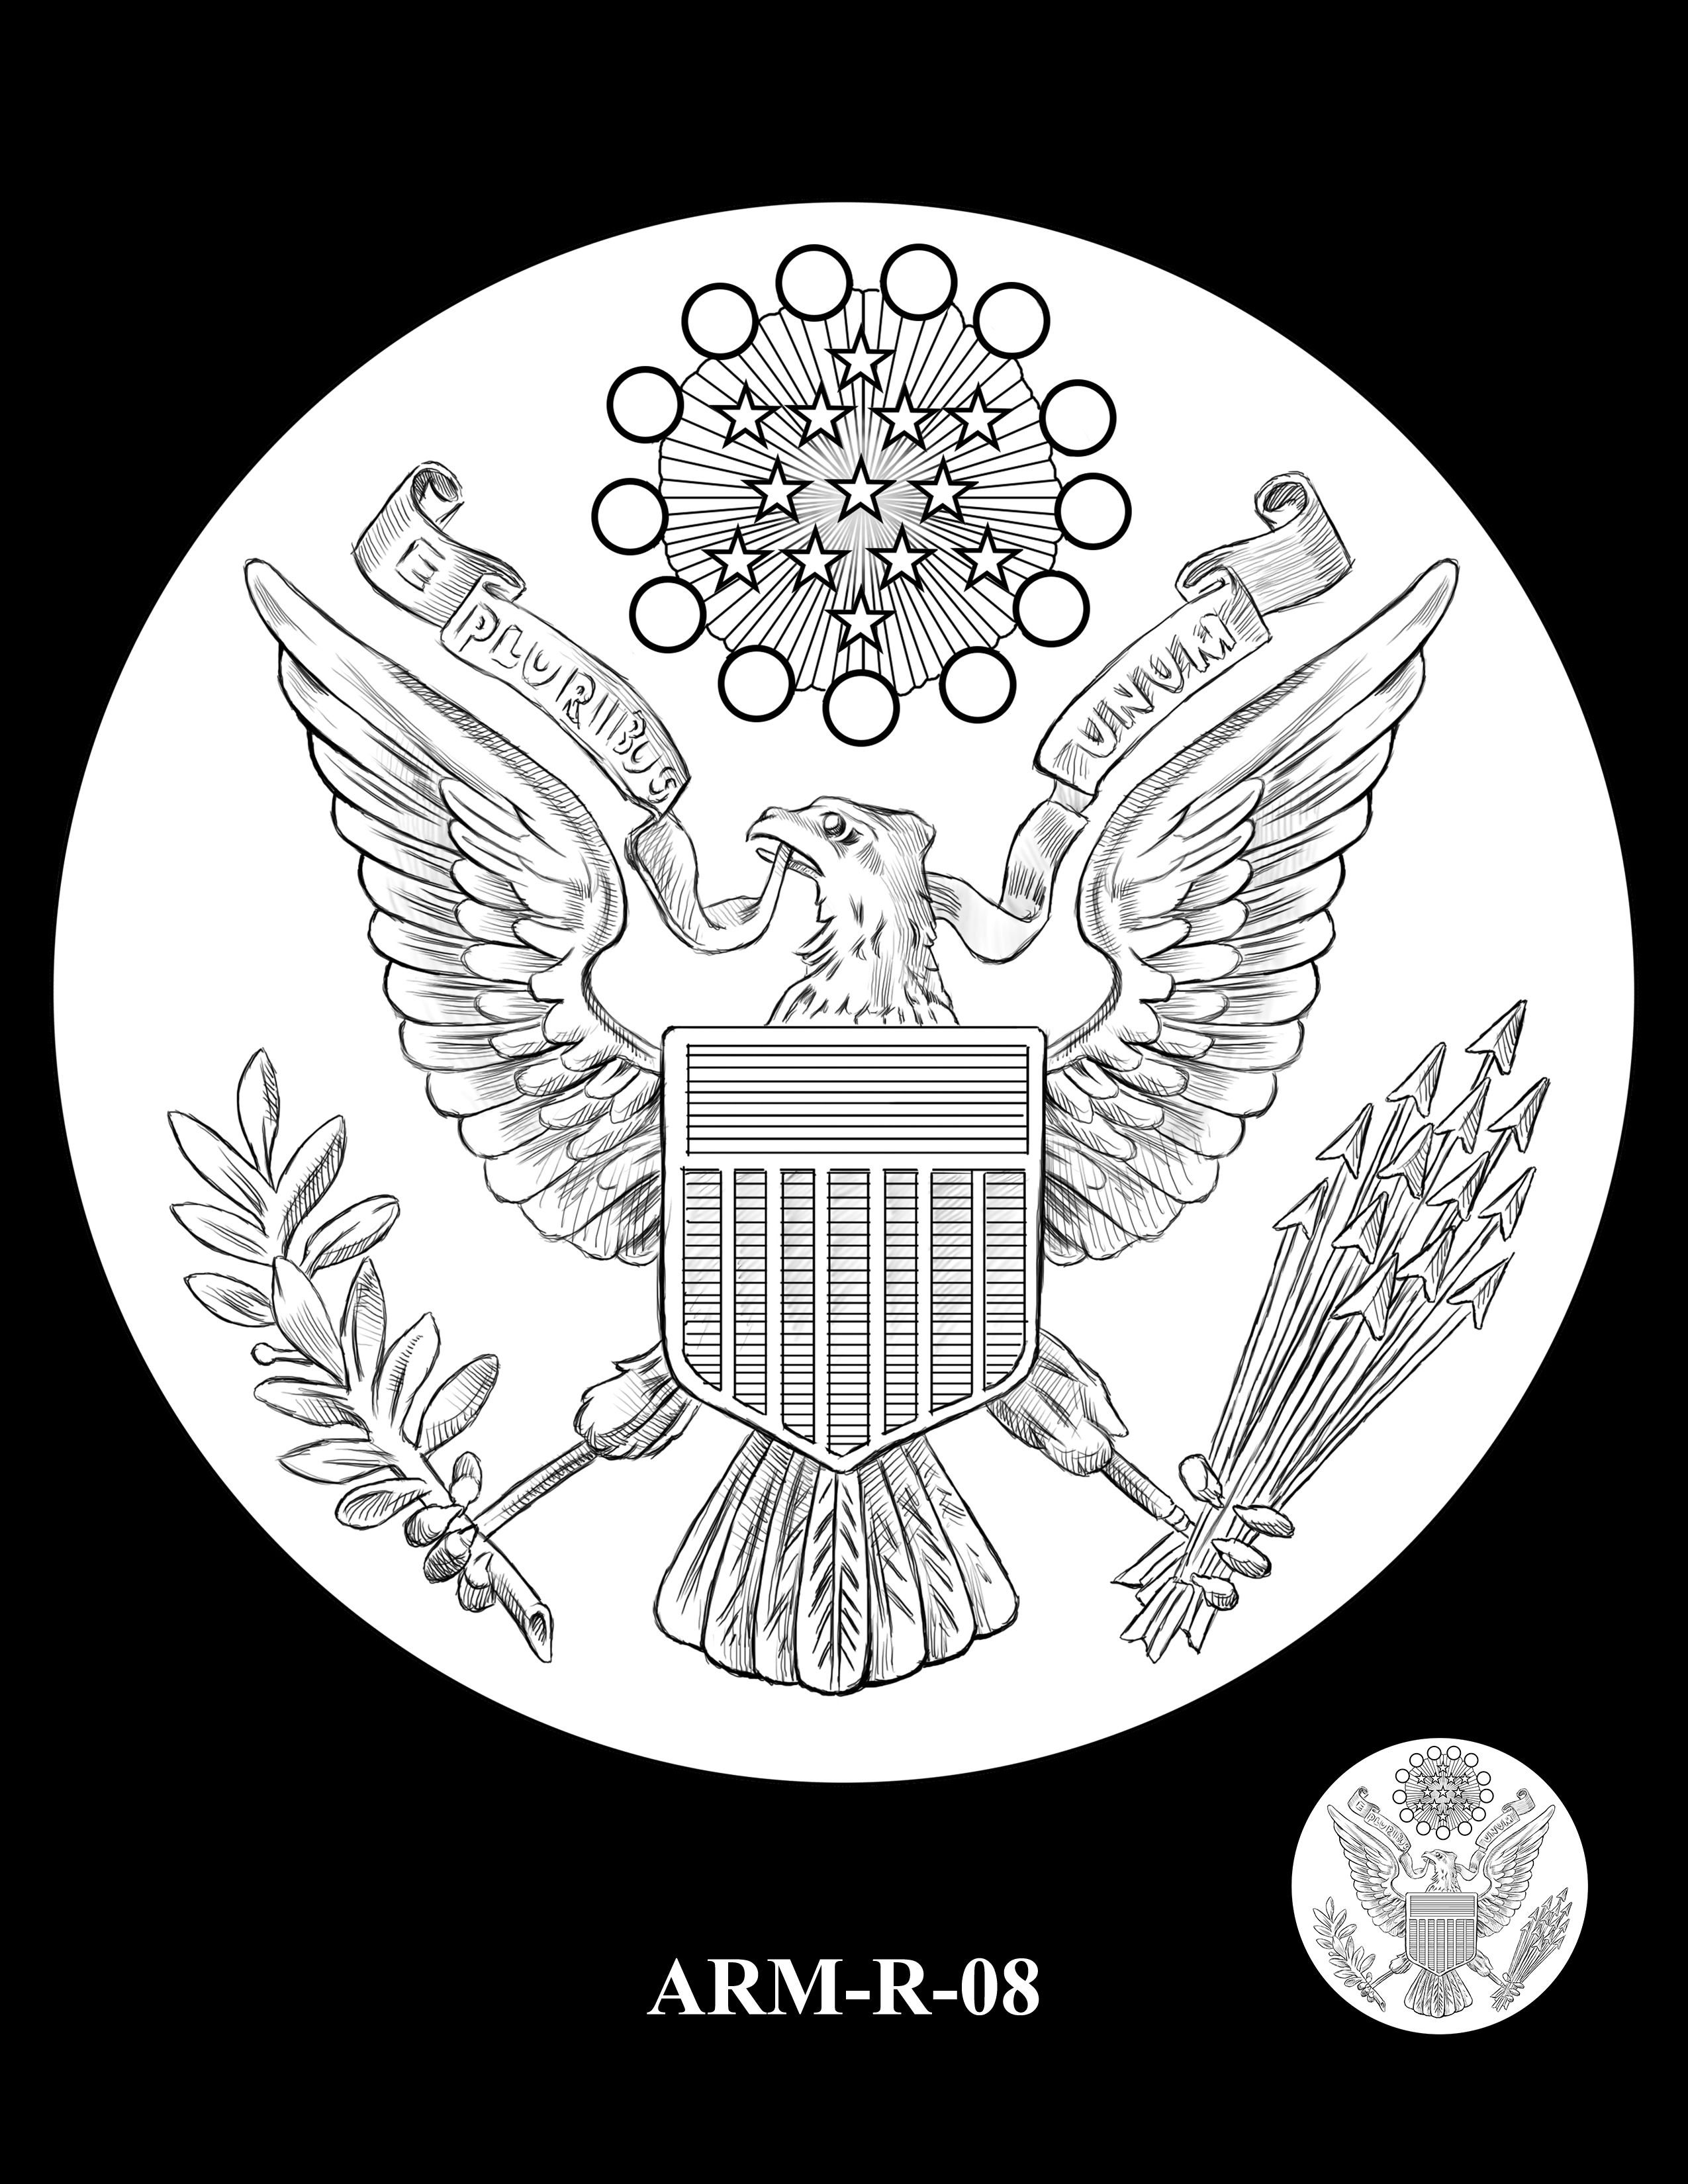 P1-ARM-R-08 -- 2018-World War I Silver Medals - Army